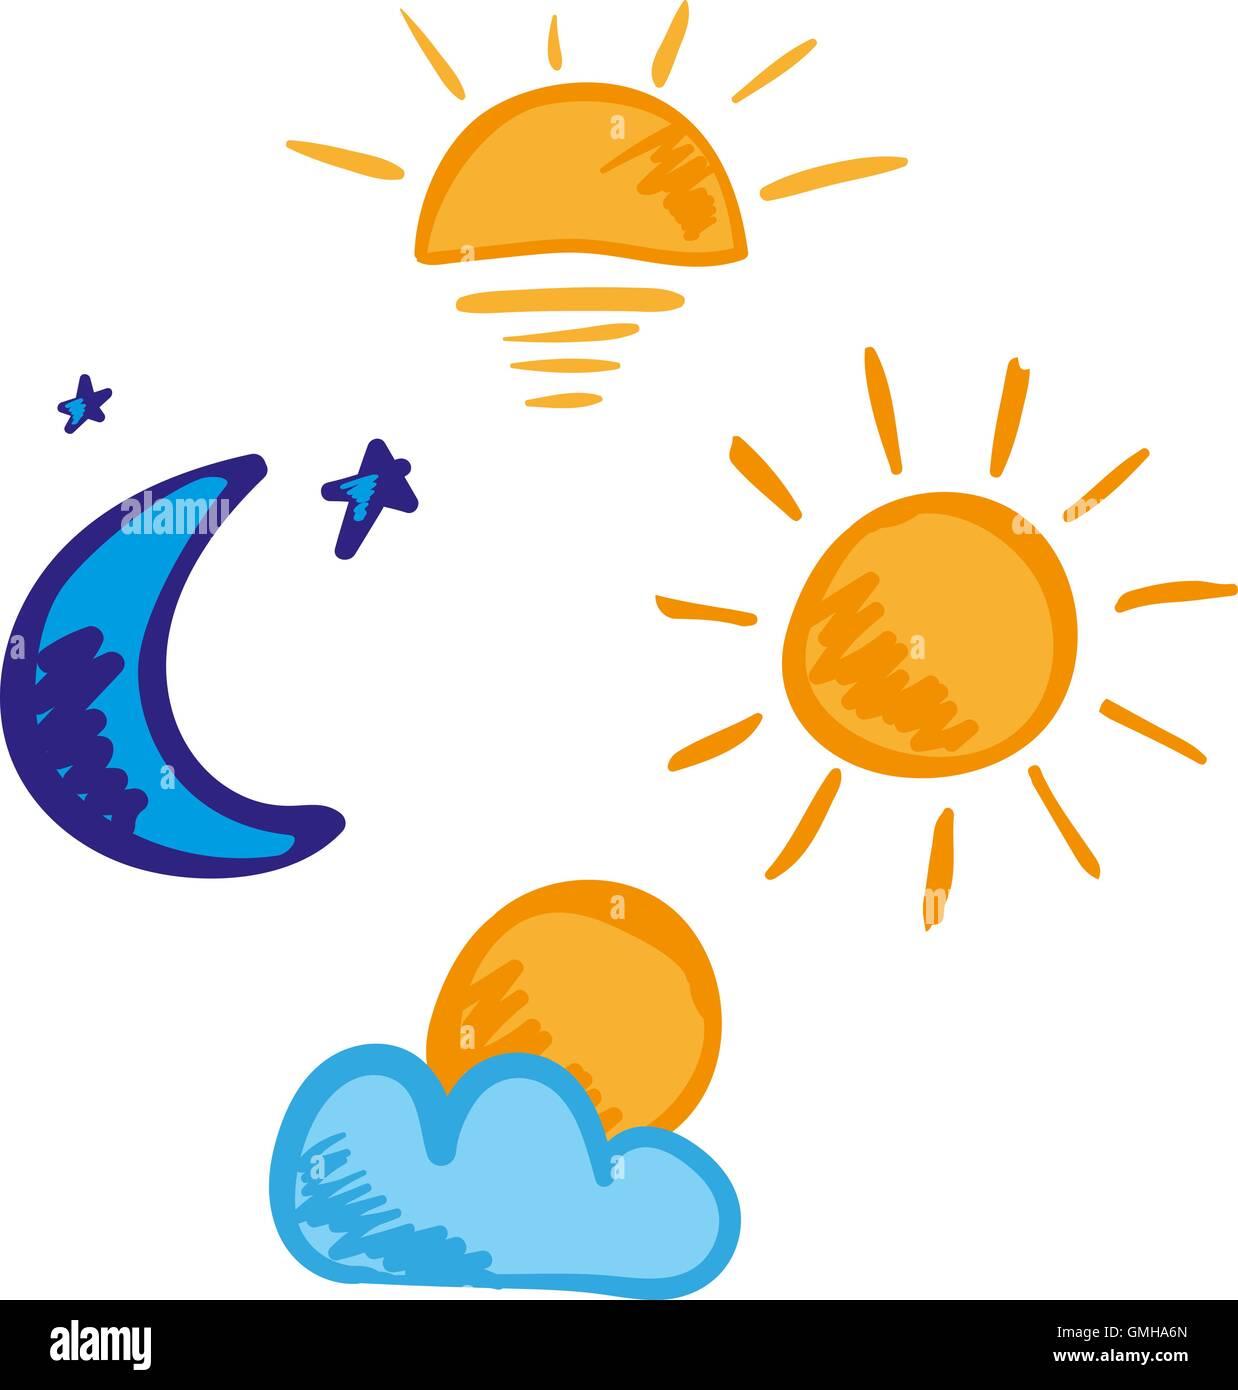 Morning Noon And Night Worksheet